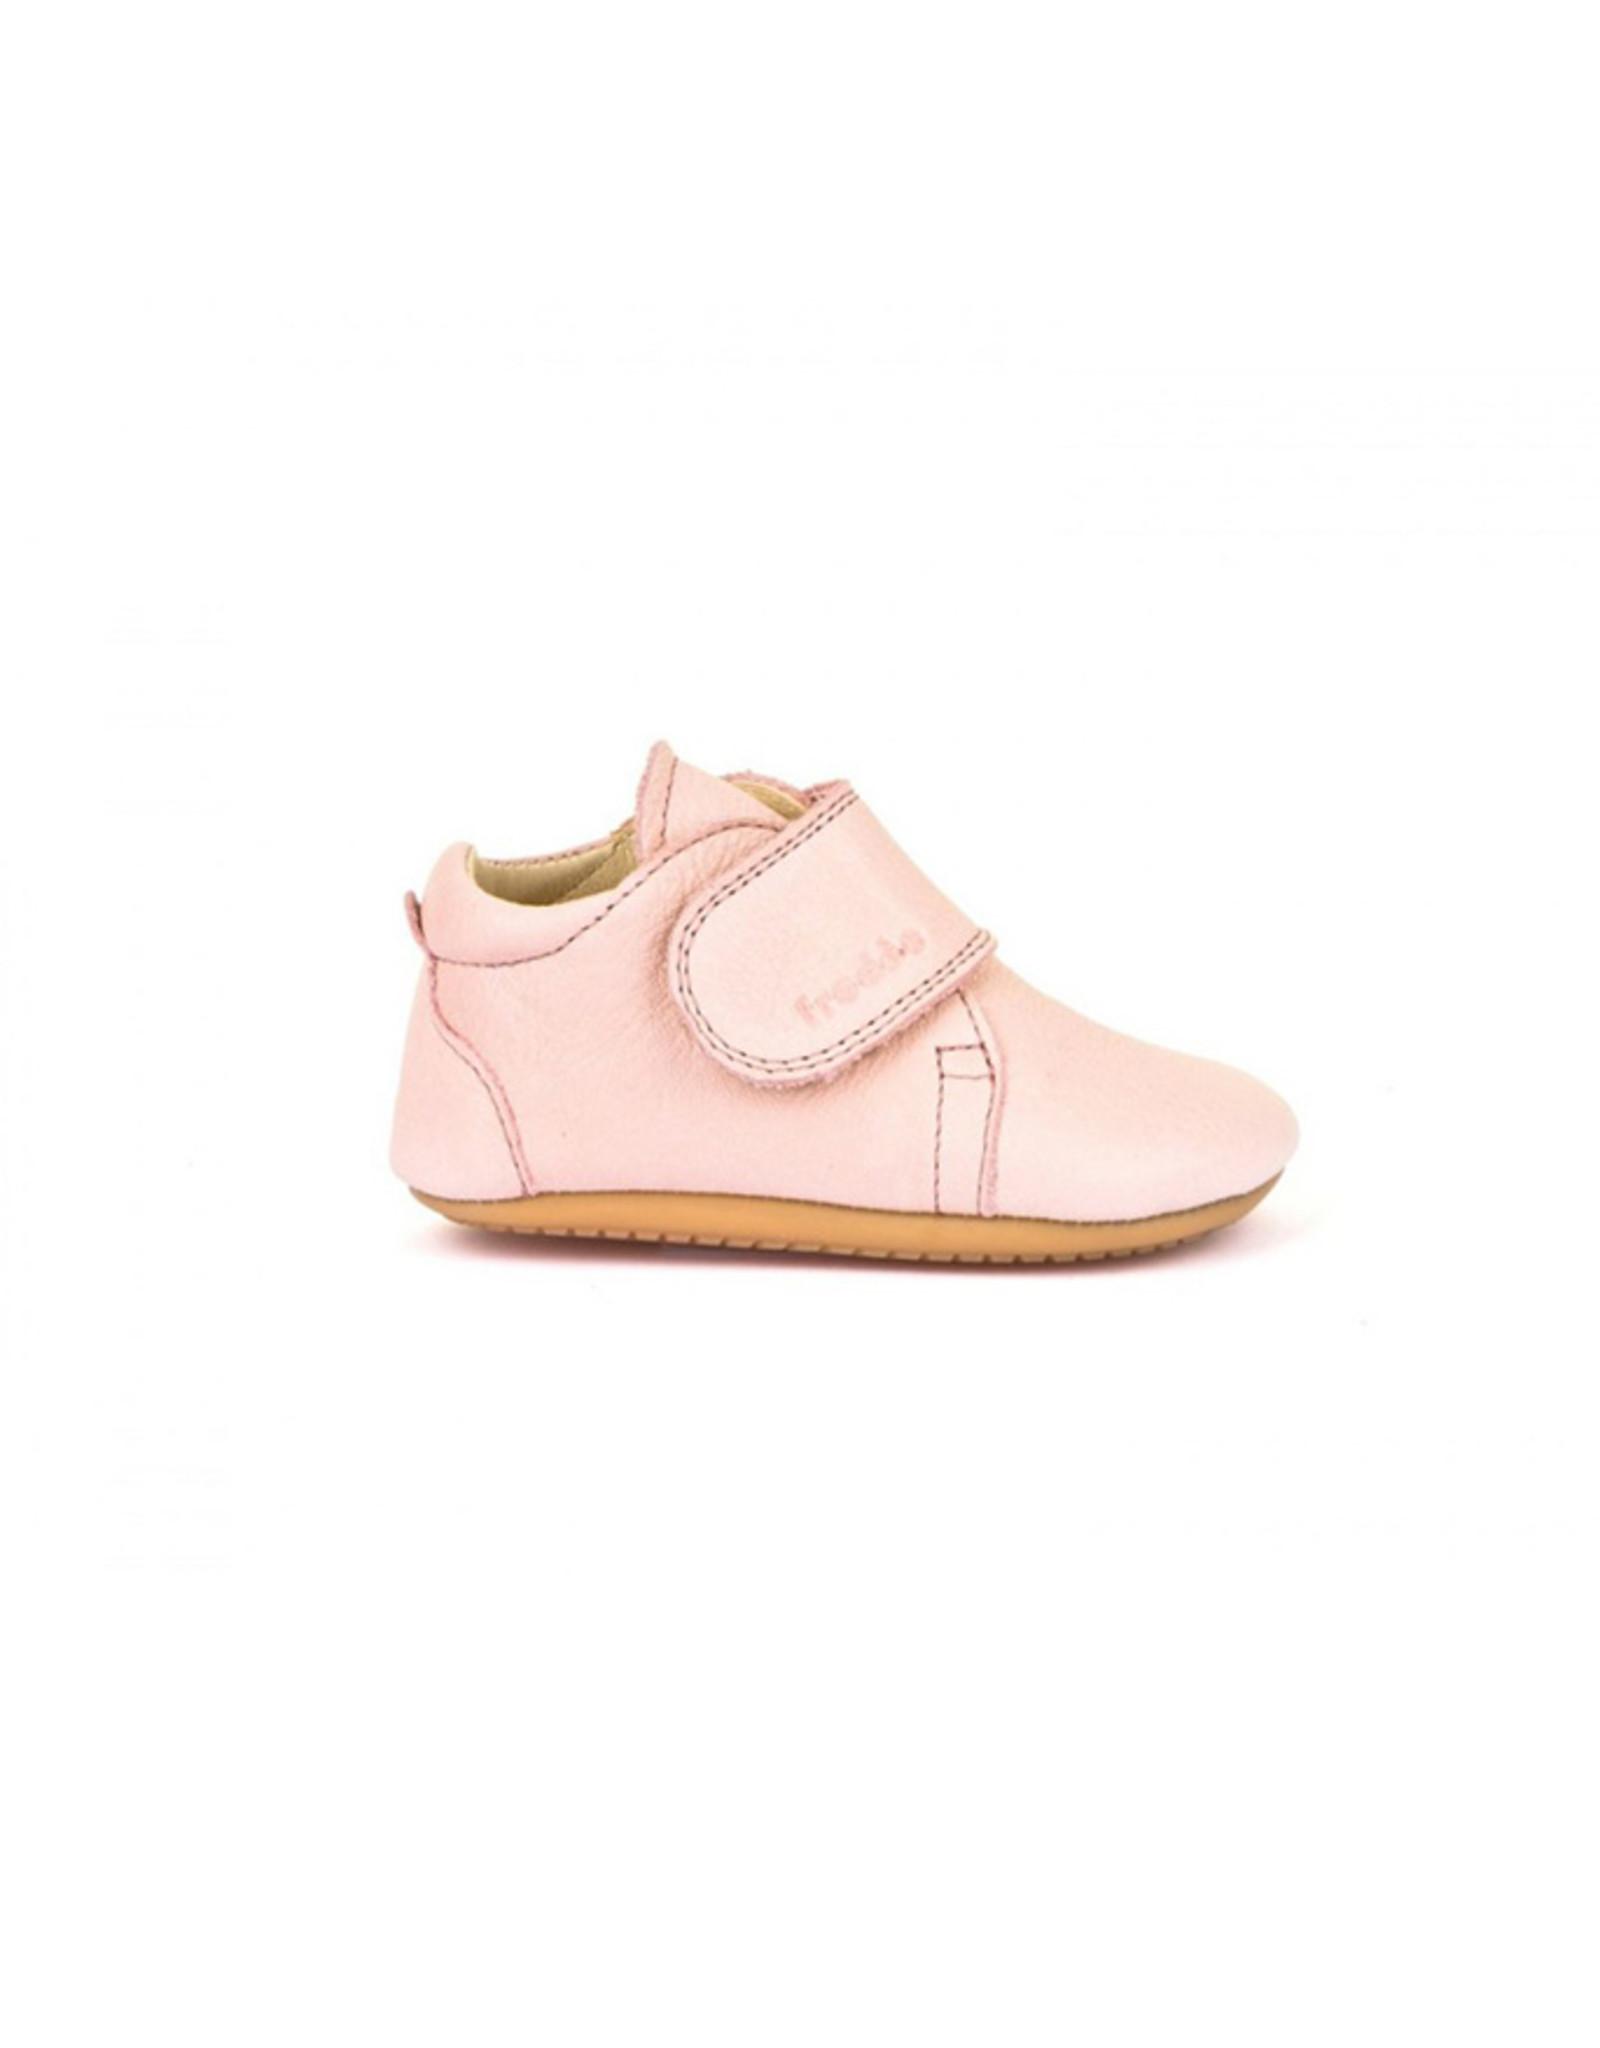 Prewalker shoes pink